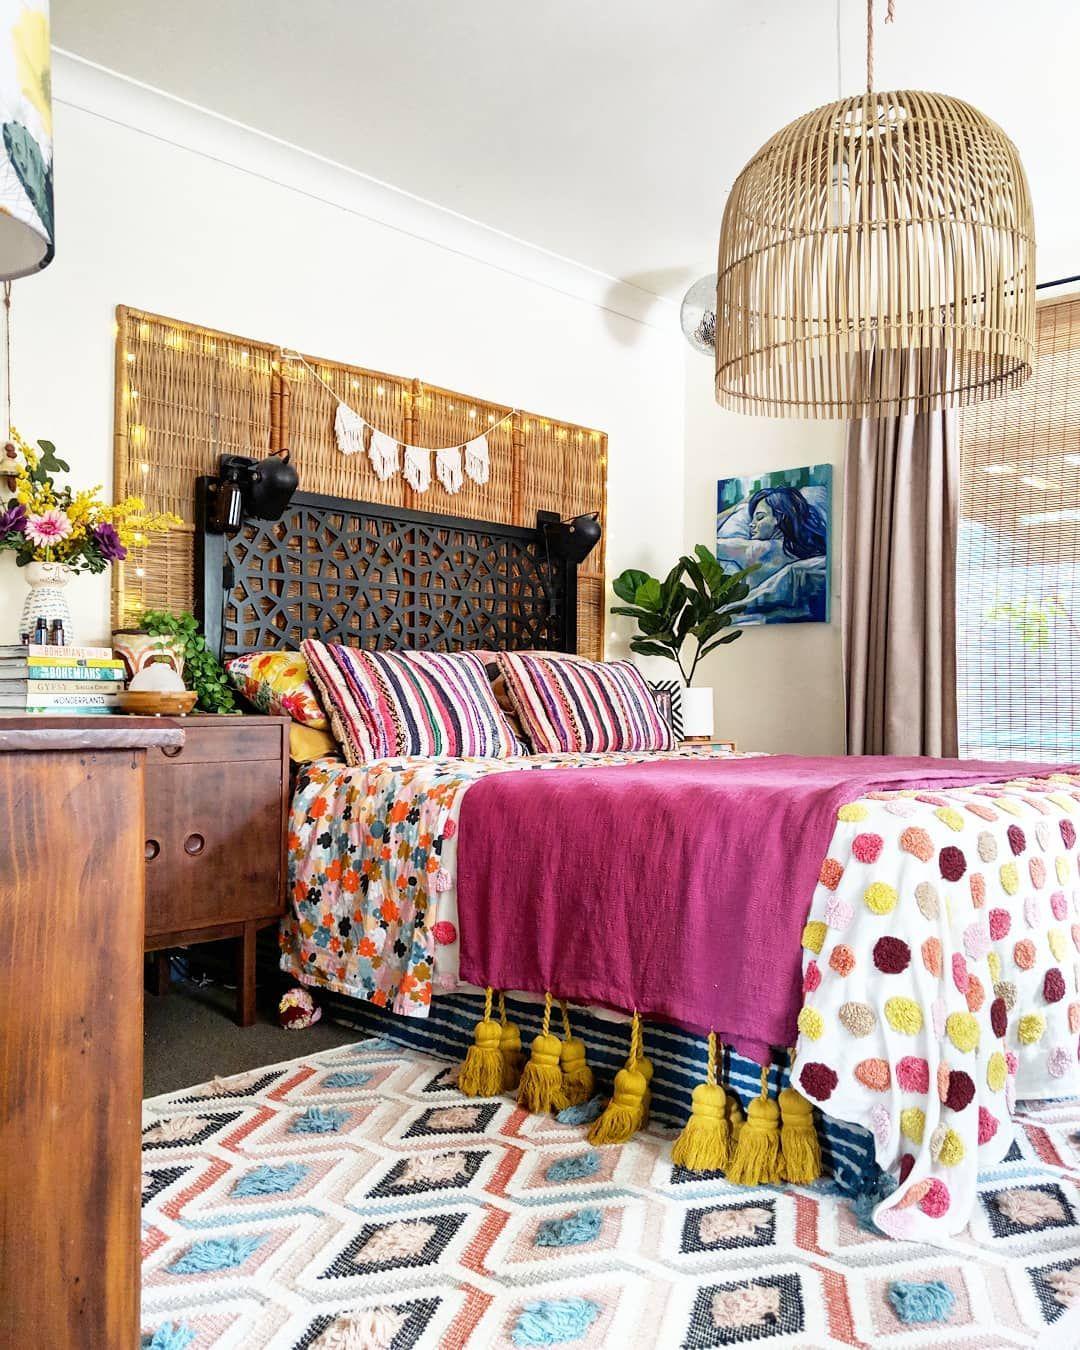 our 5 favorite instagram hashtags for interior design — dlghtd